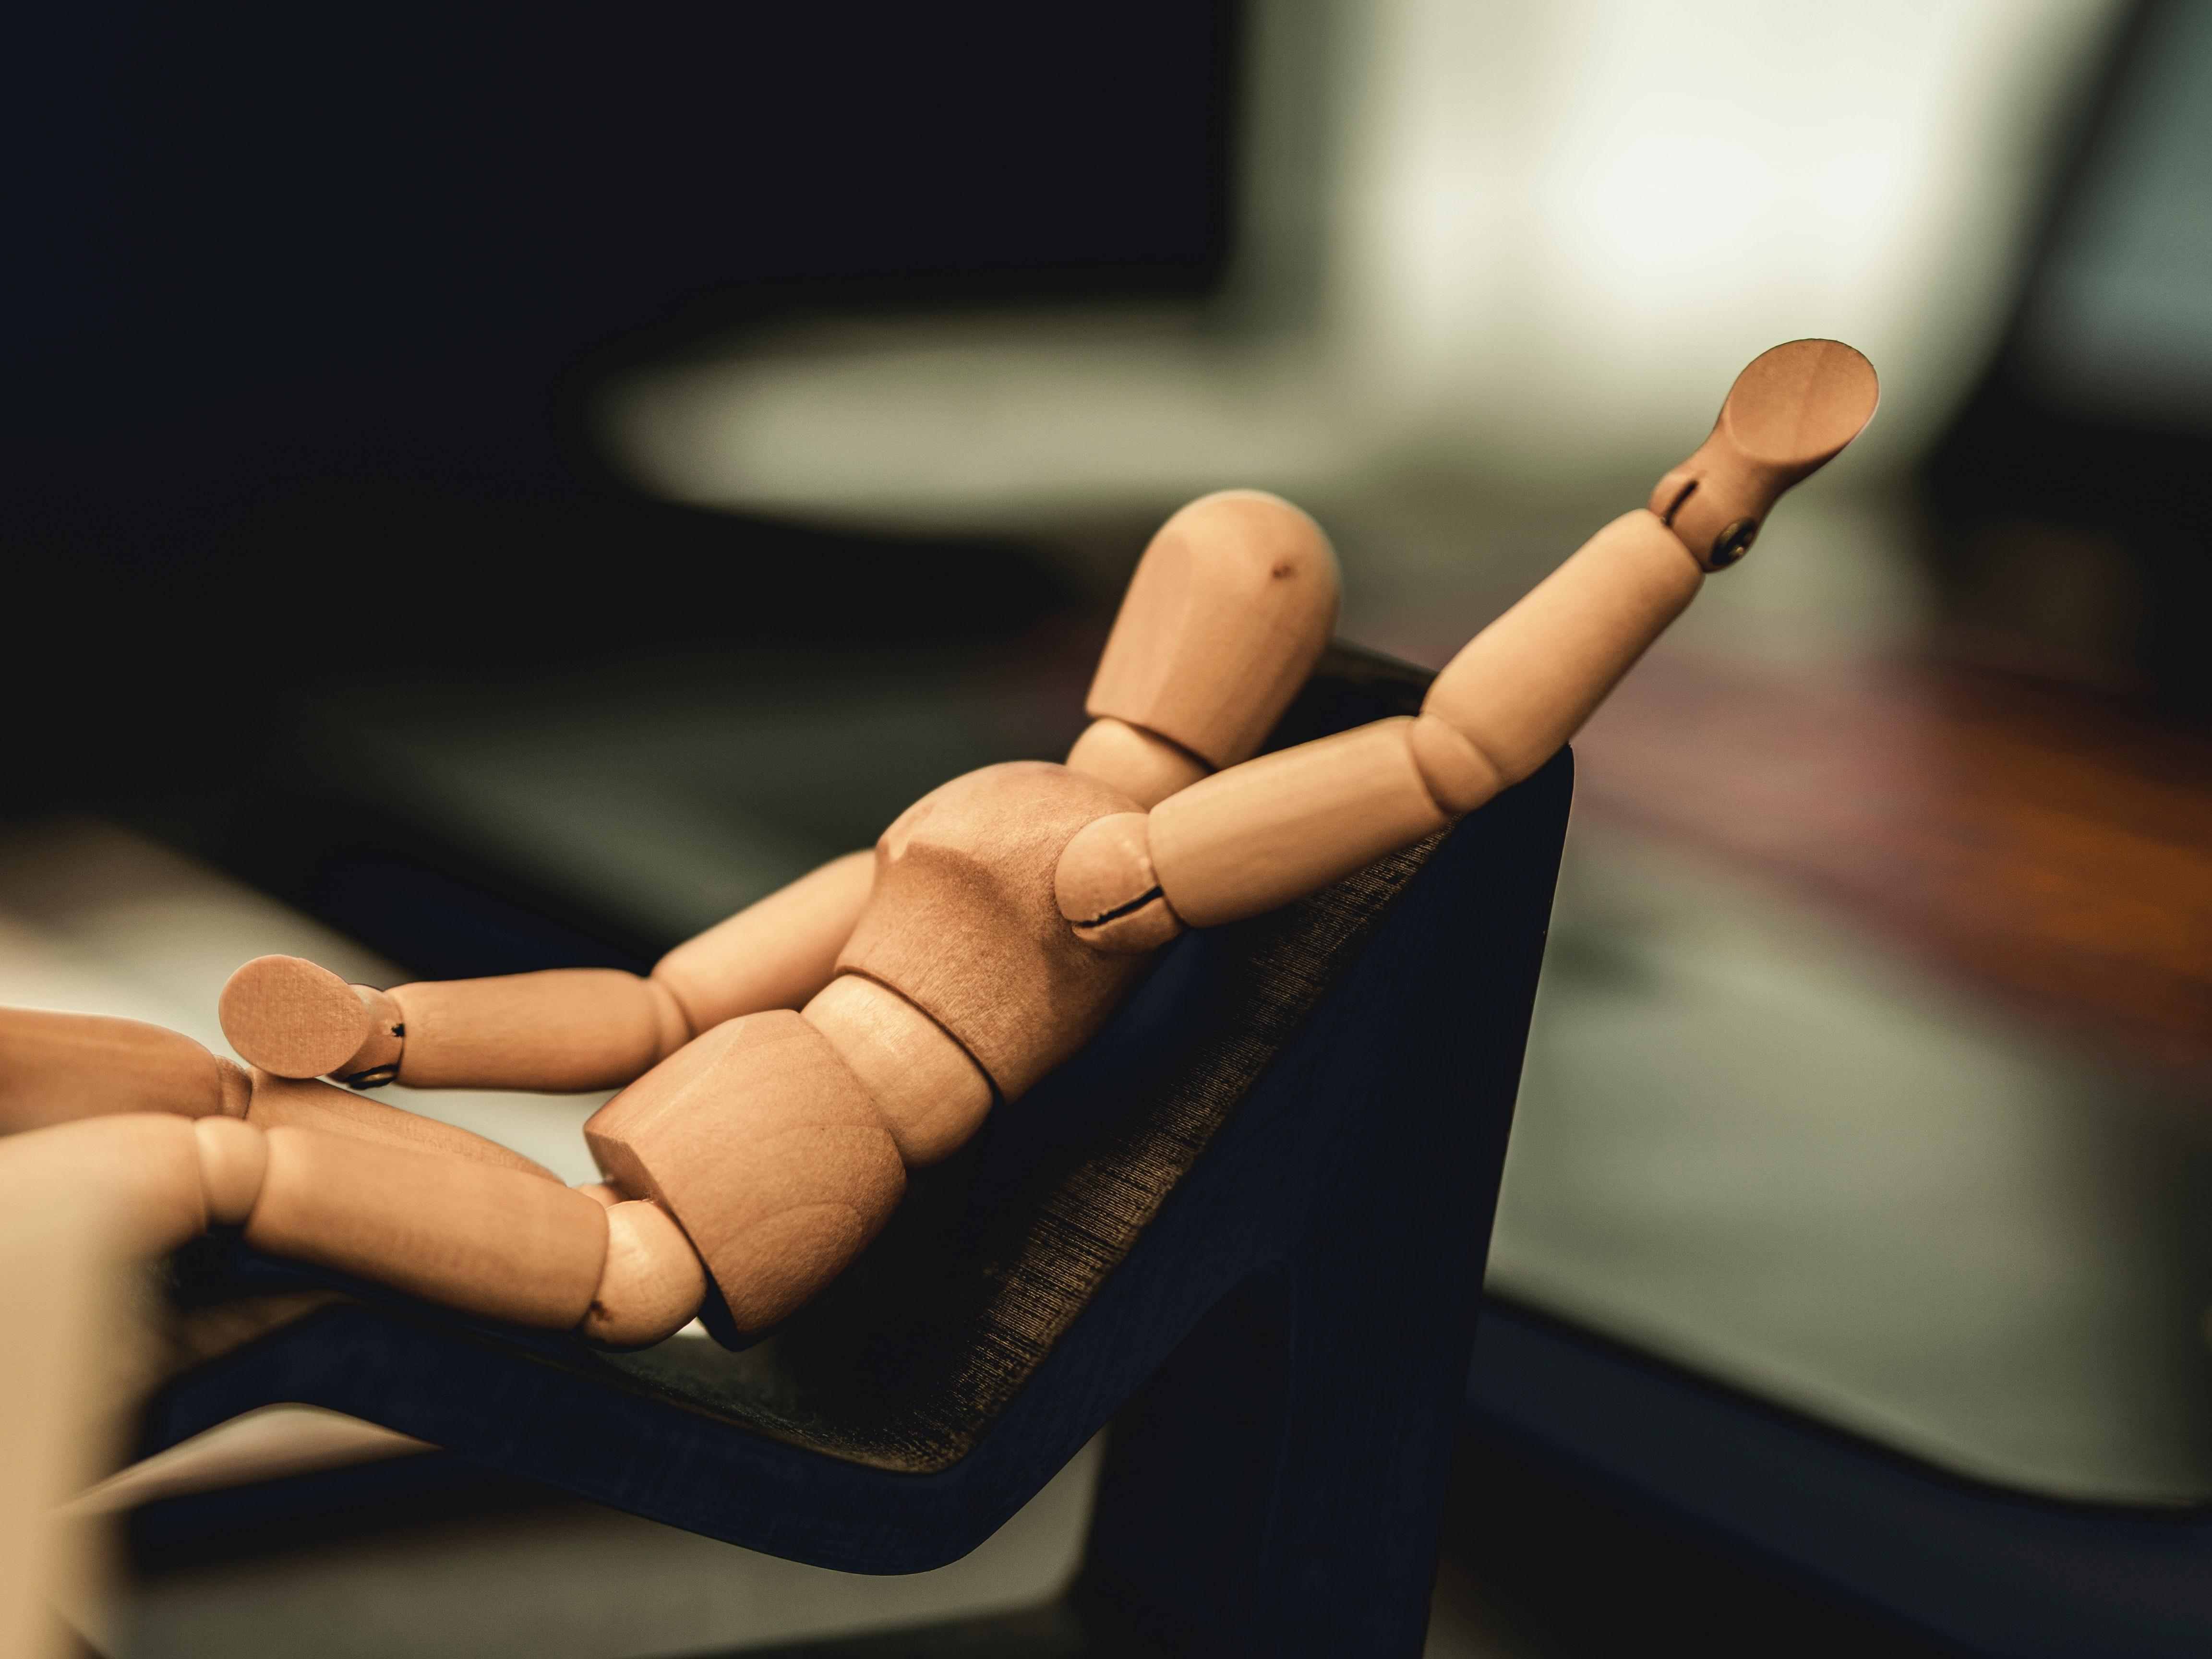 Posing wooden figurine. Photo courtesy of Milan Degraeve on Unsplash.